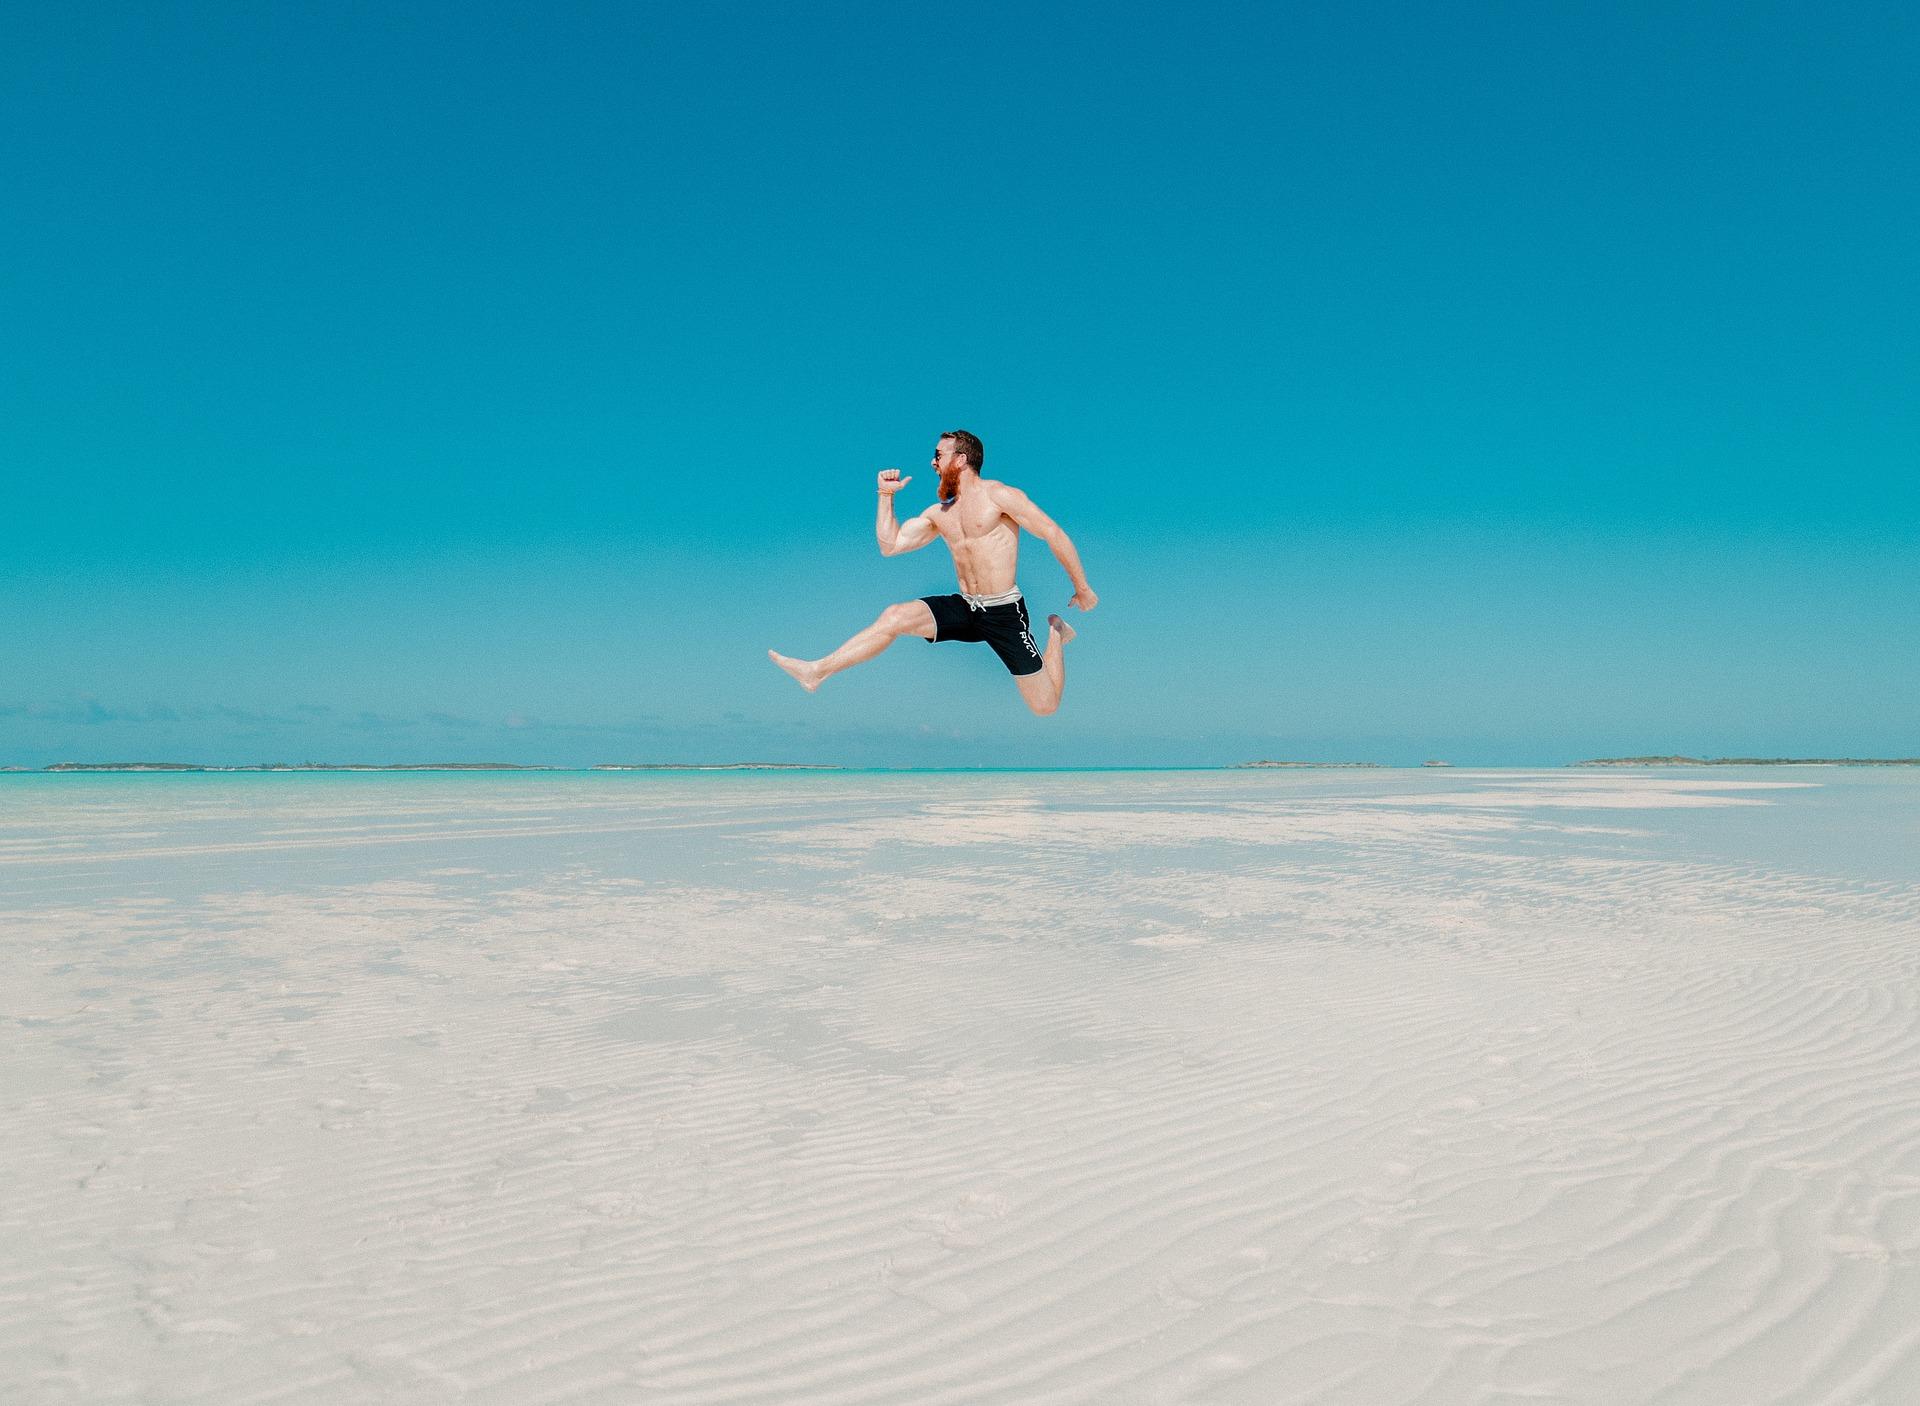 man-jumping-on-the-beach-to-boost-self-esteem.jpg